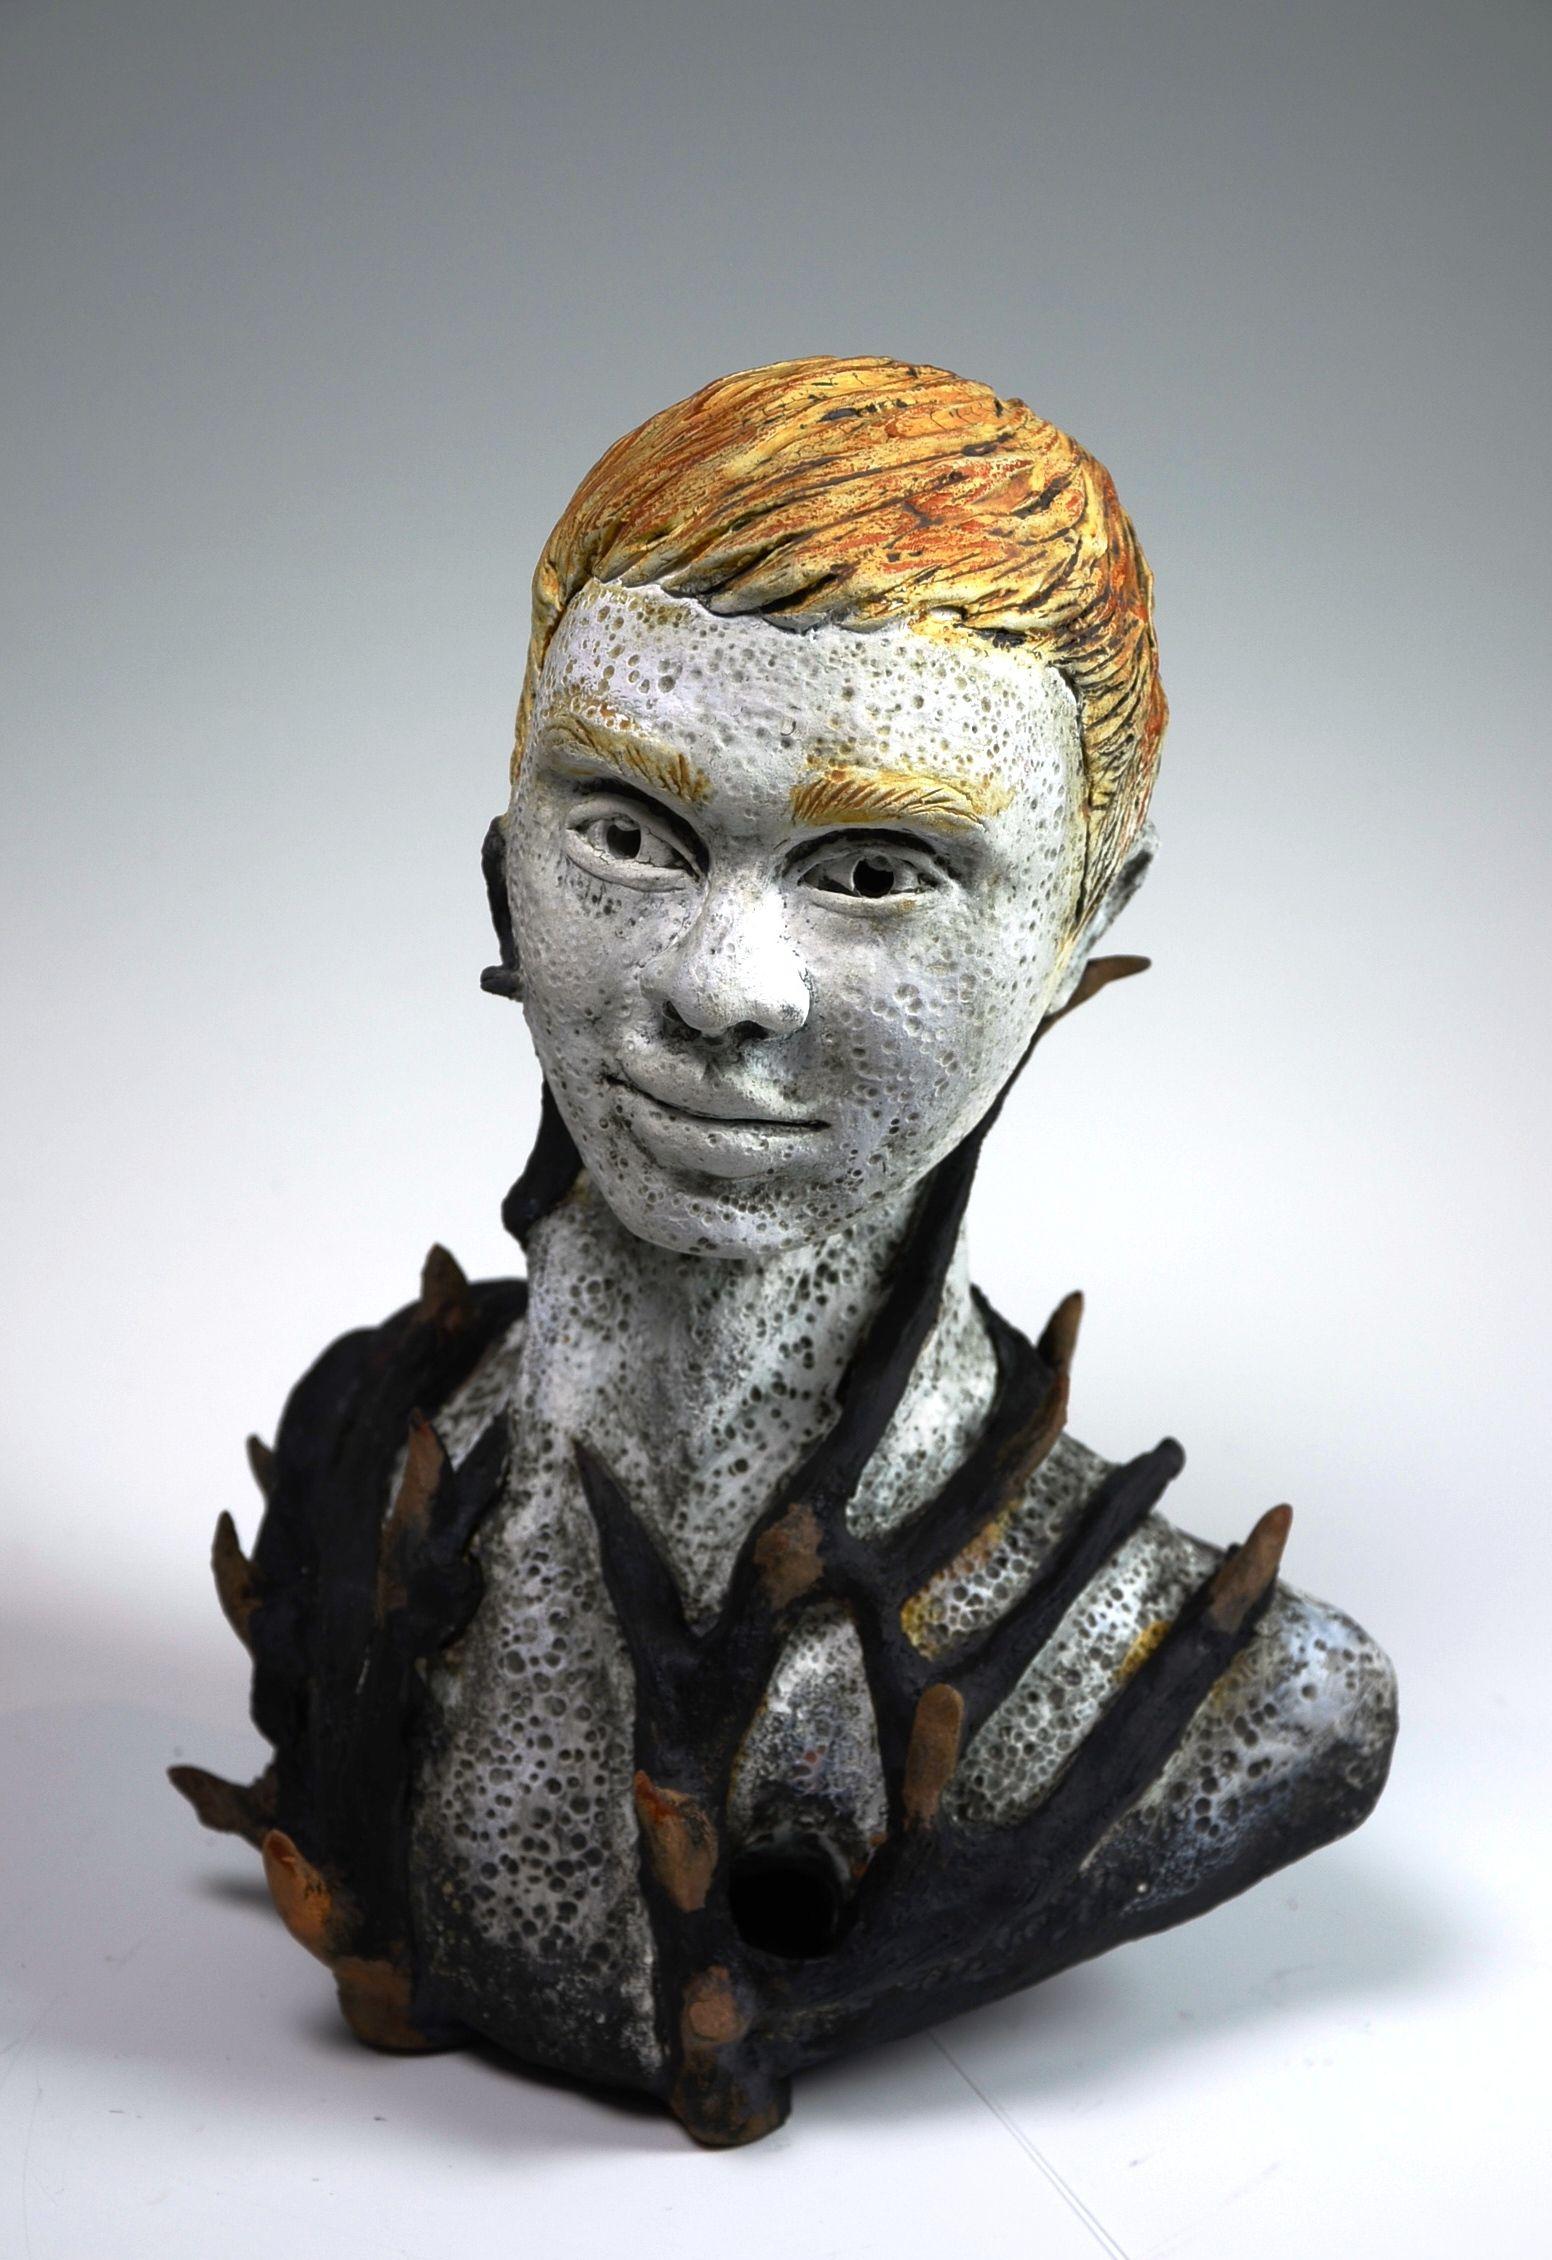 3e76b7b625f yellow - man - bust - Jorge Martell - Entangled - figurative sculpture